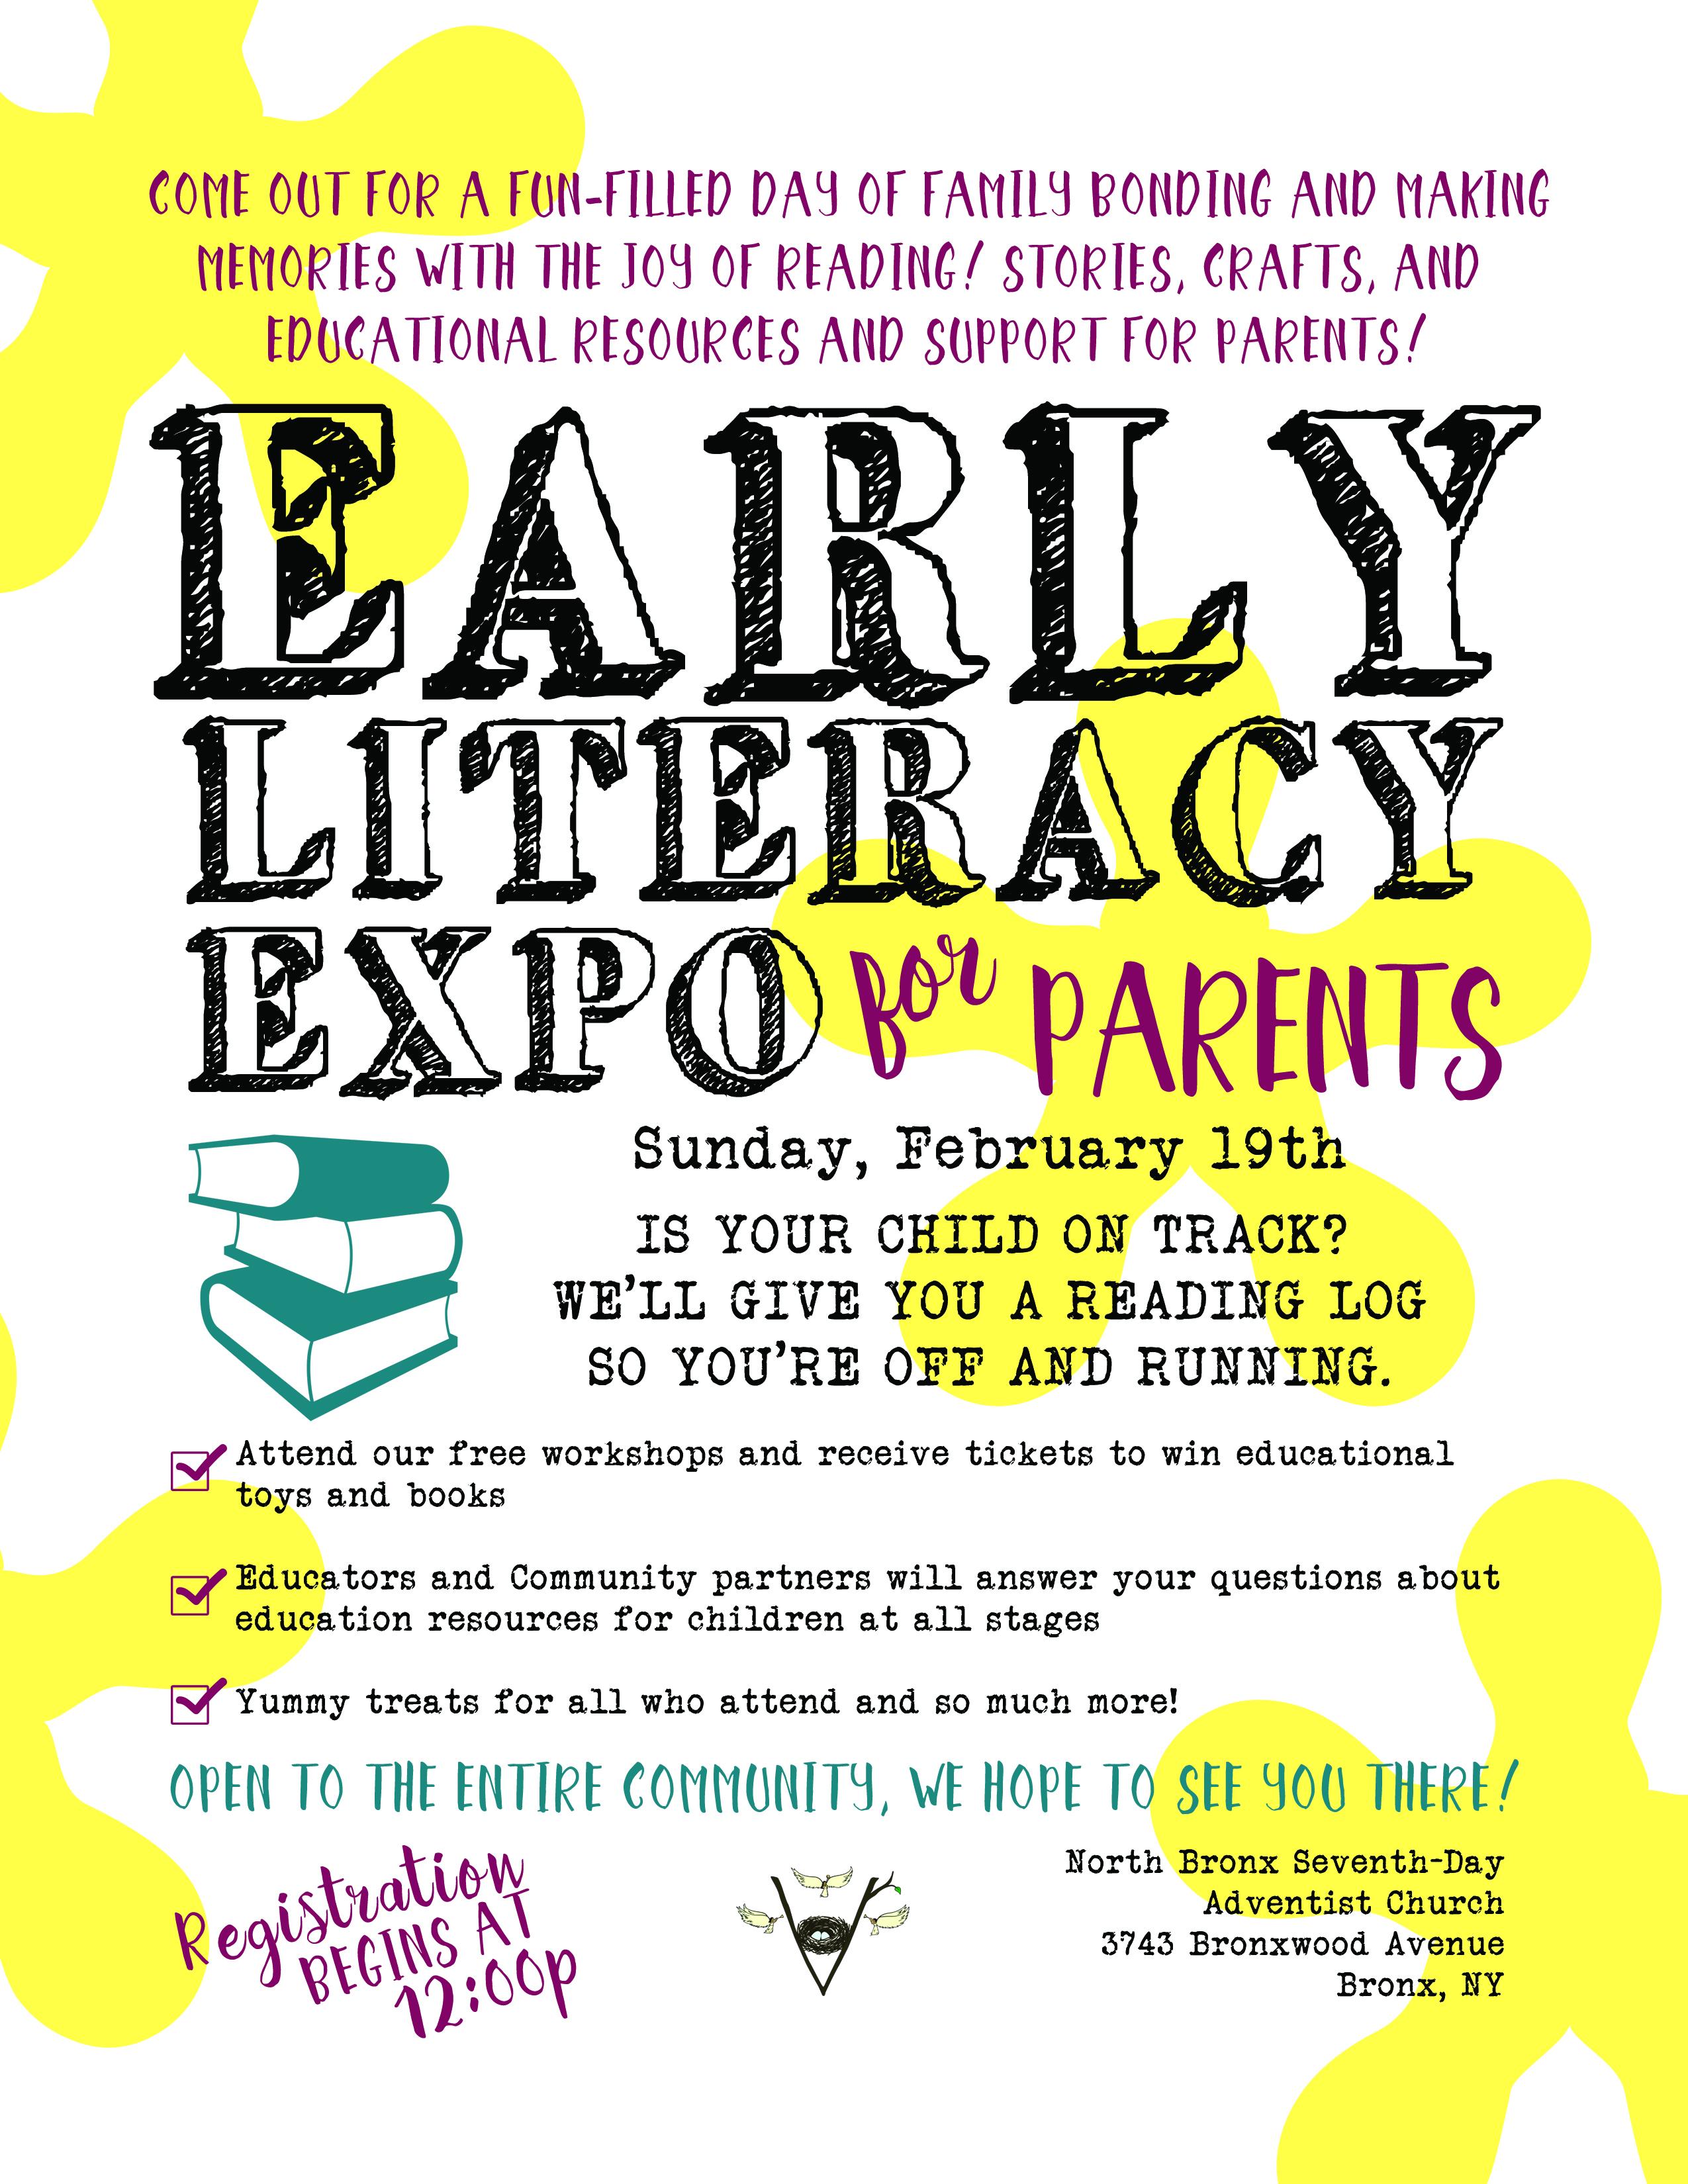 Early Literacy Expo flyer.jpg